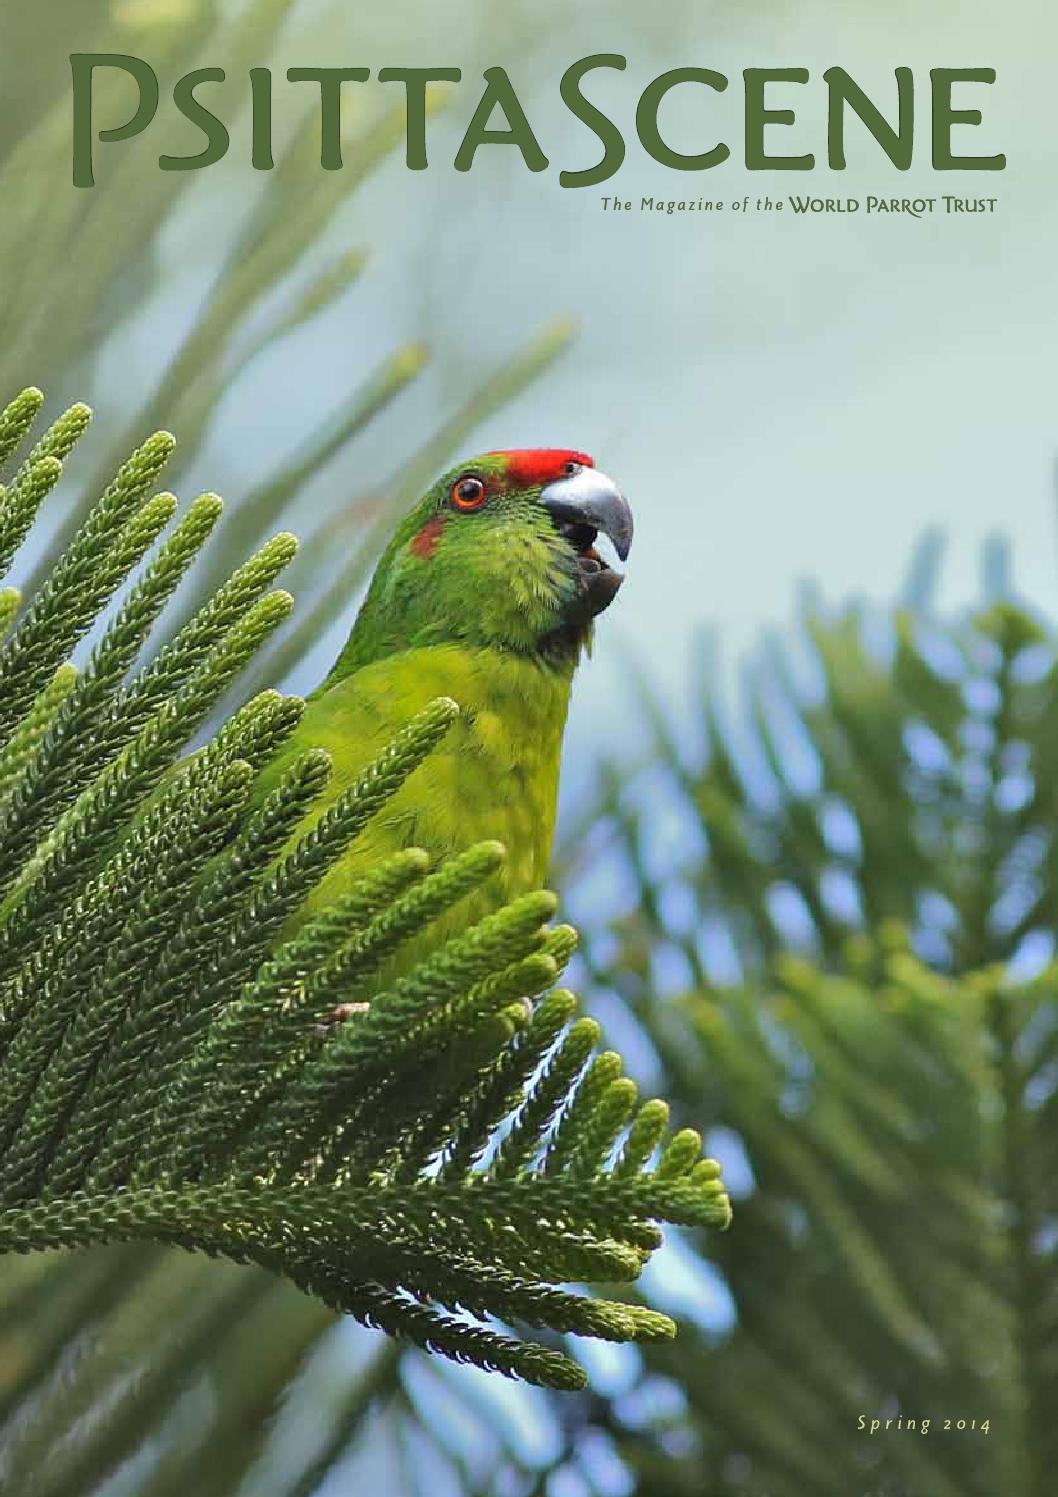 PsittaScene Spring 2014 by World Parrot Trust - issuu